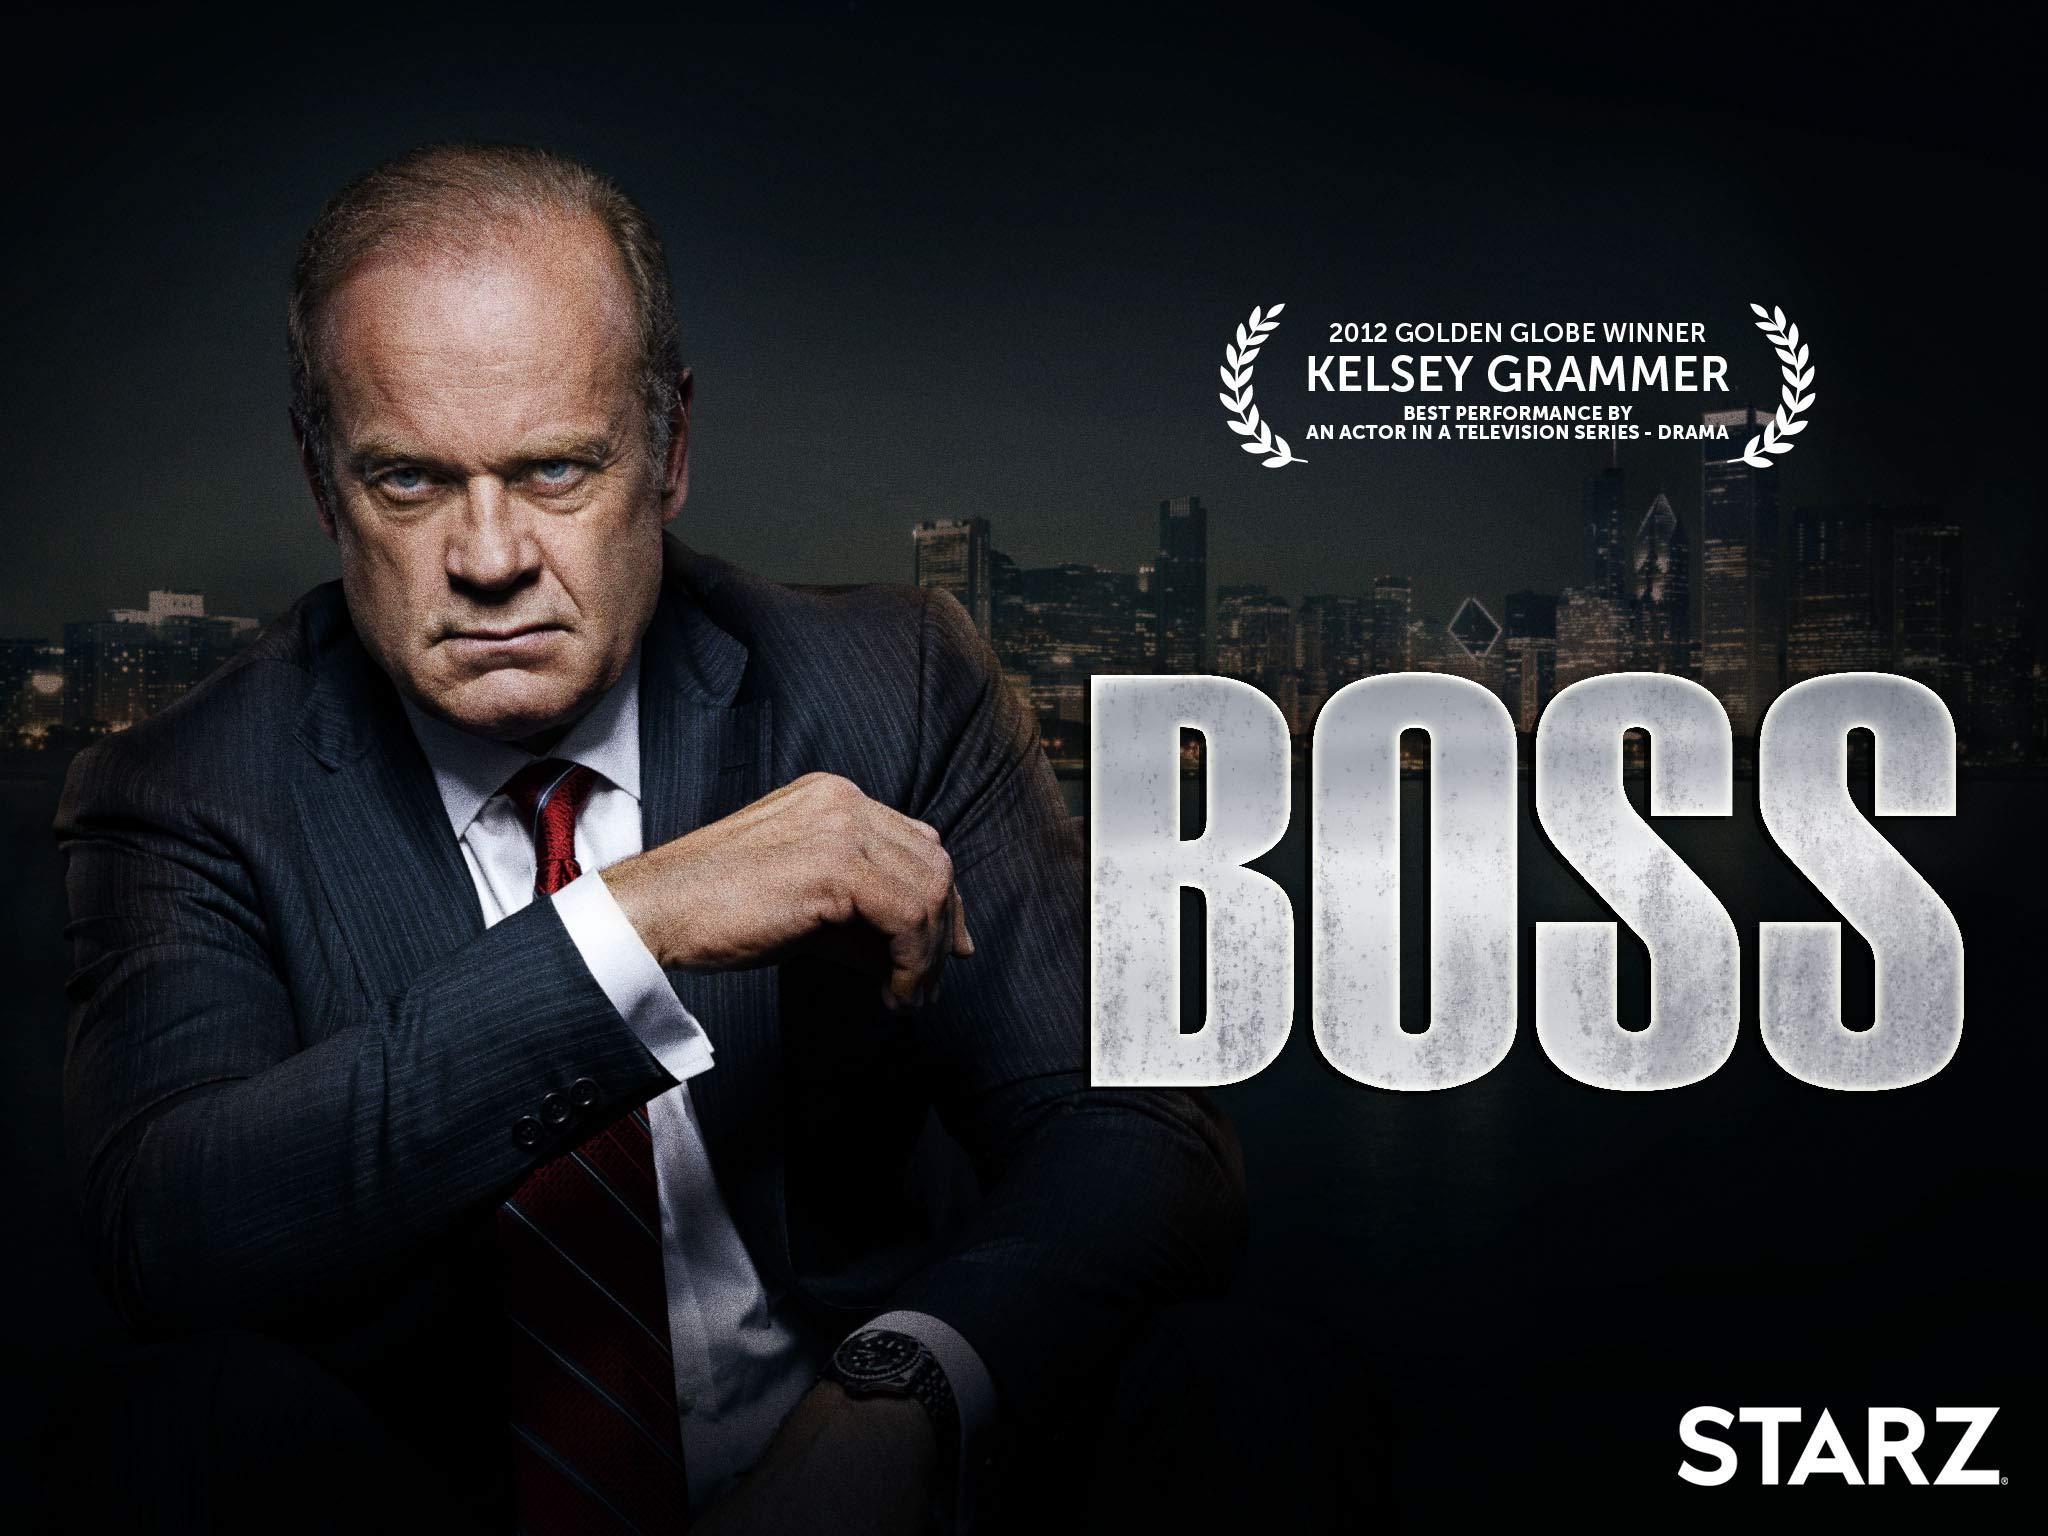 Boss S2 1080p WEB-DL Dual